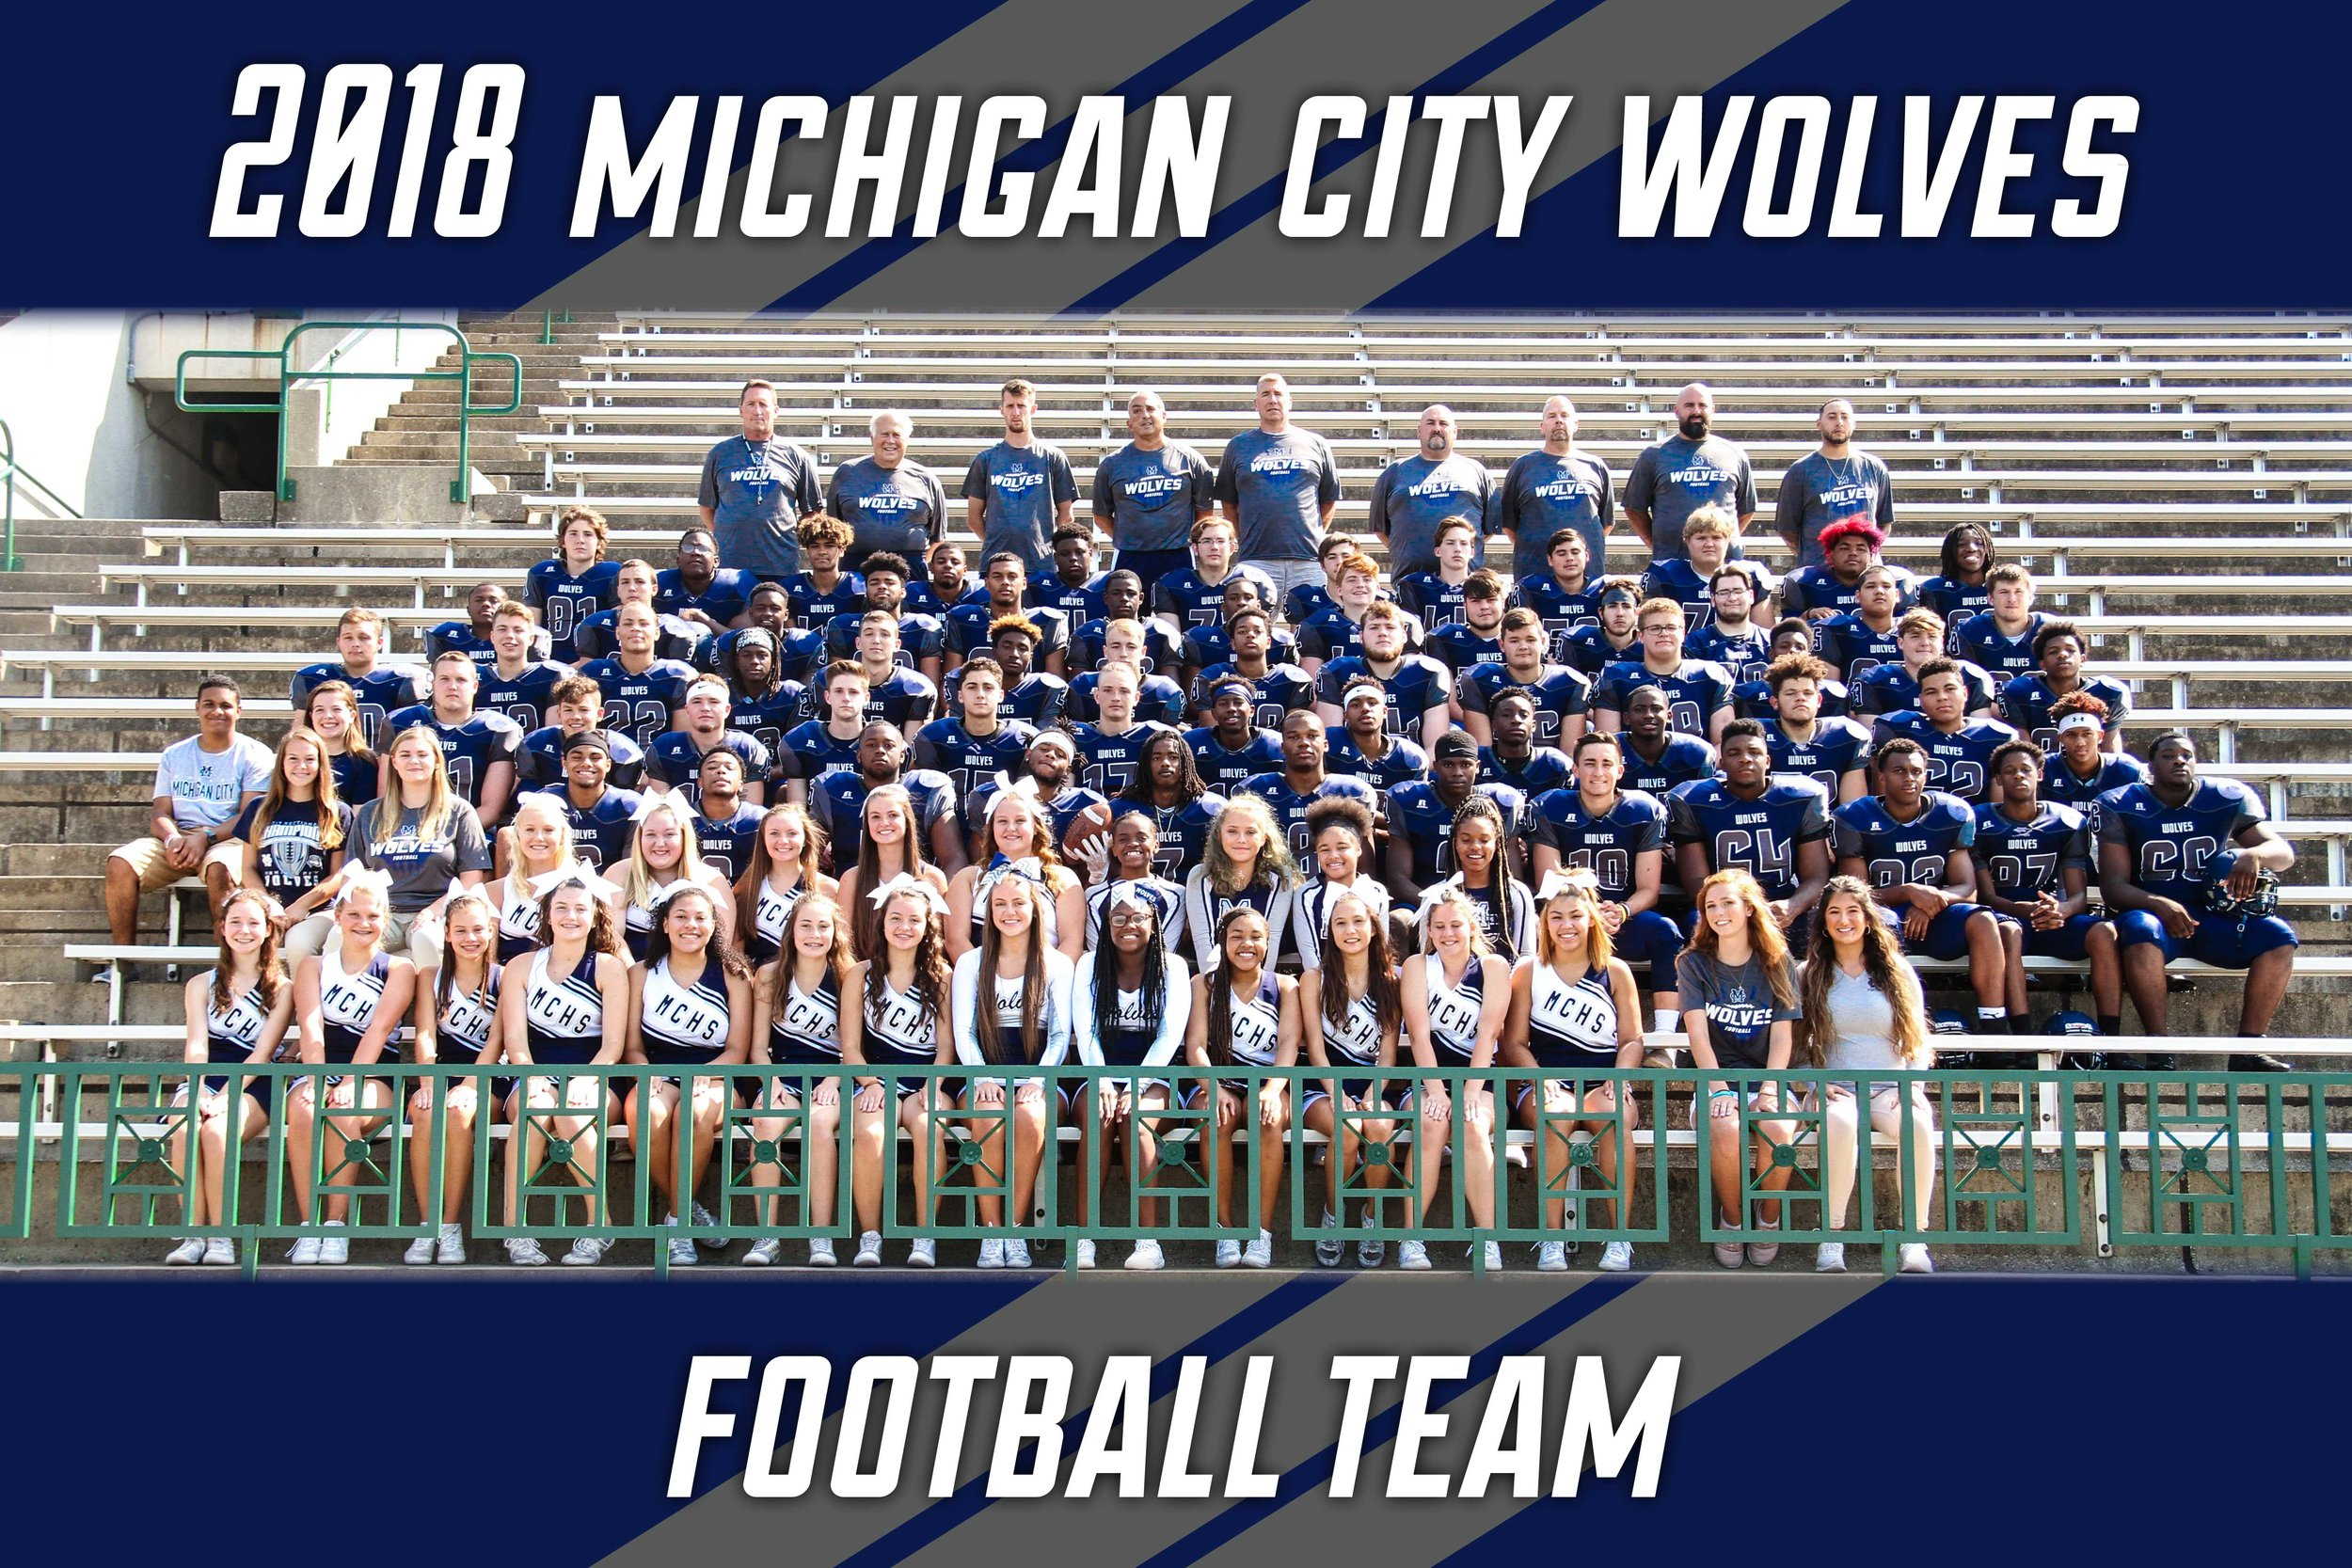 2018 michigan city wolves team.jpg